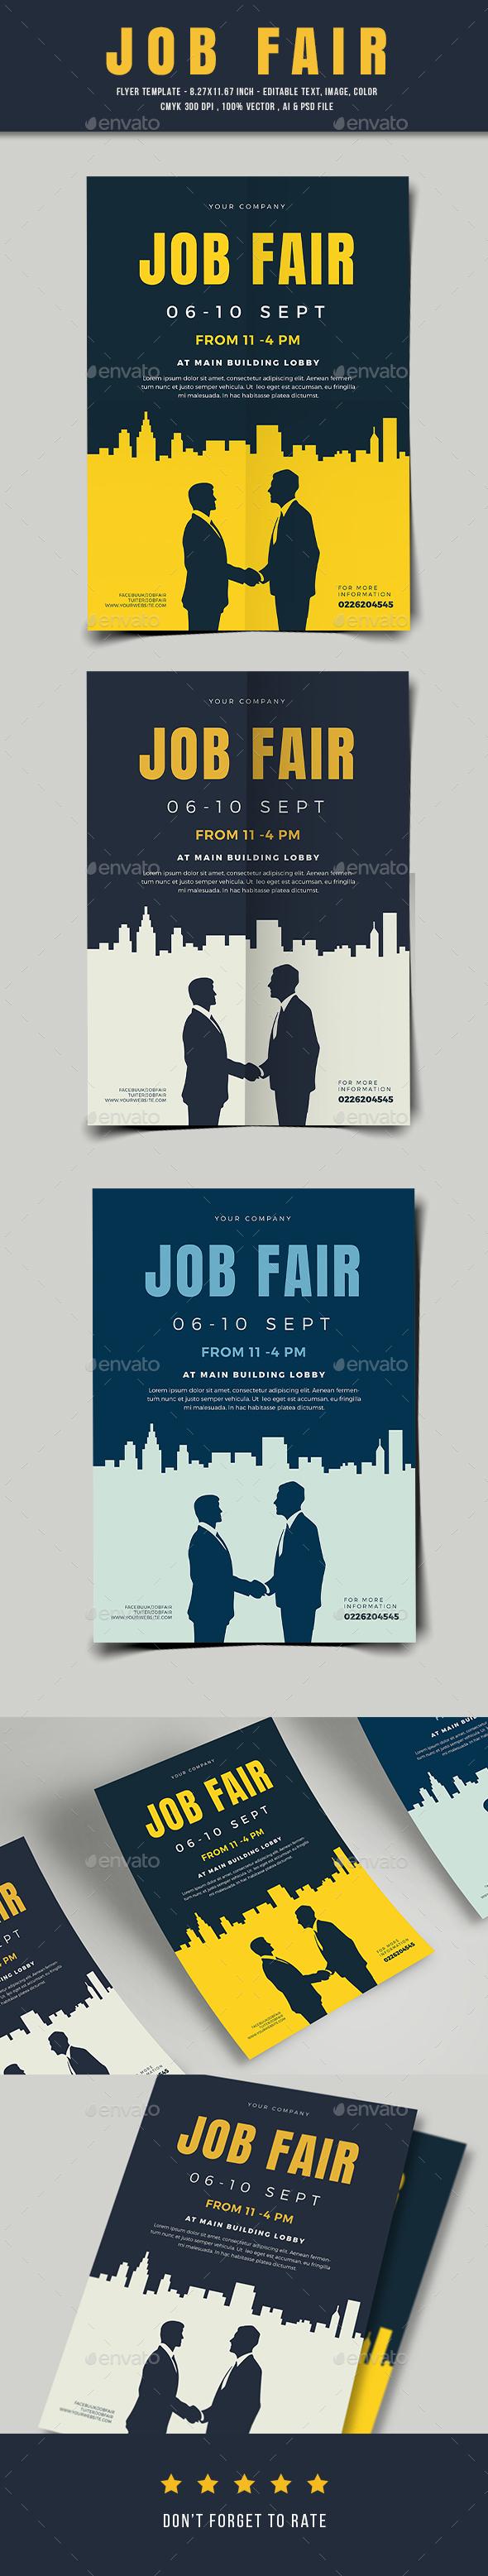 Job Fair Flyer Template 02 - Events Flyers